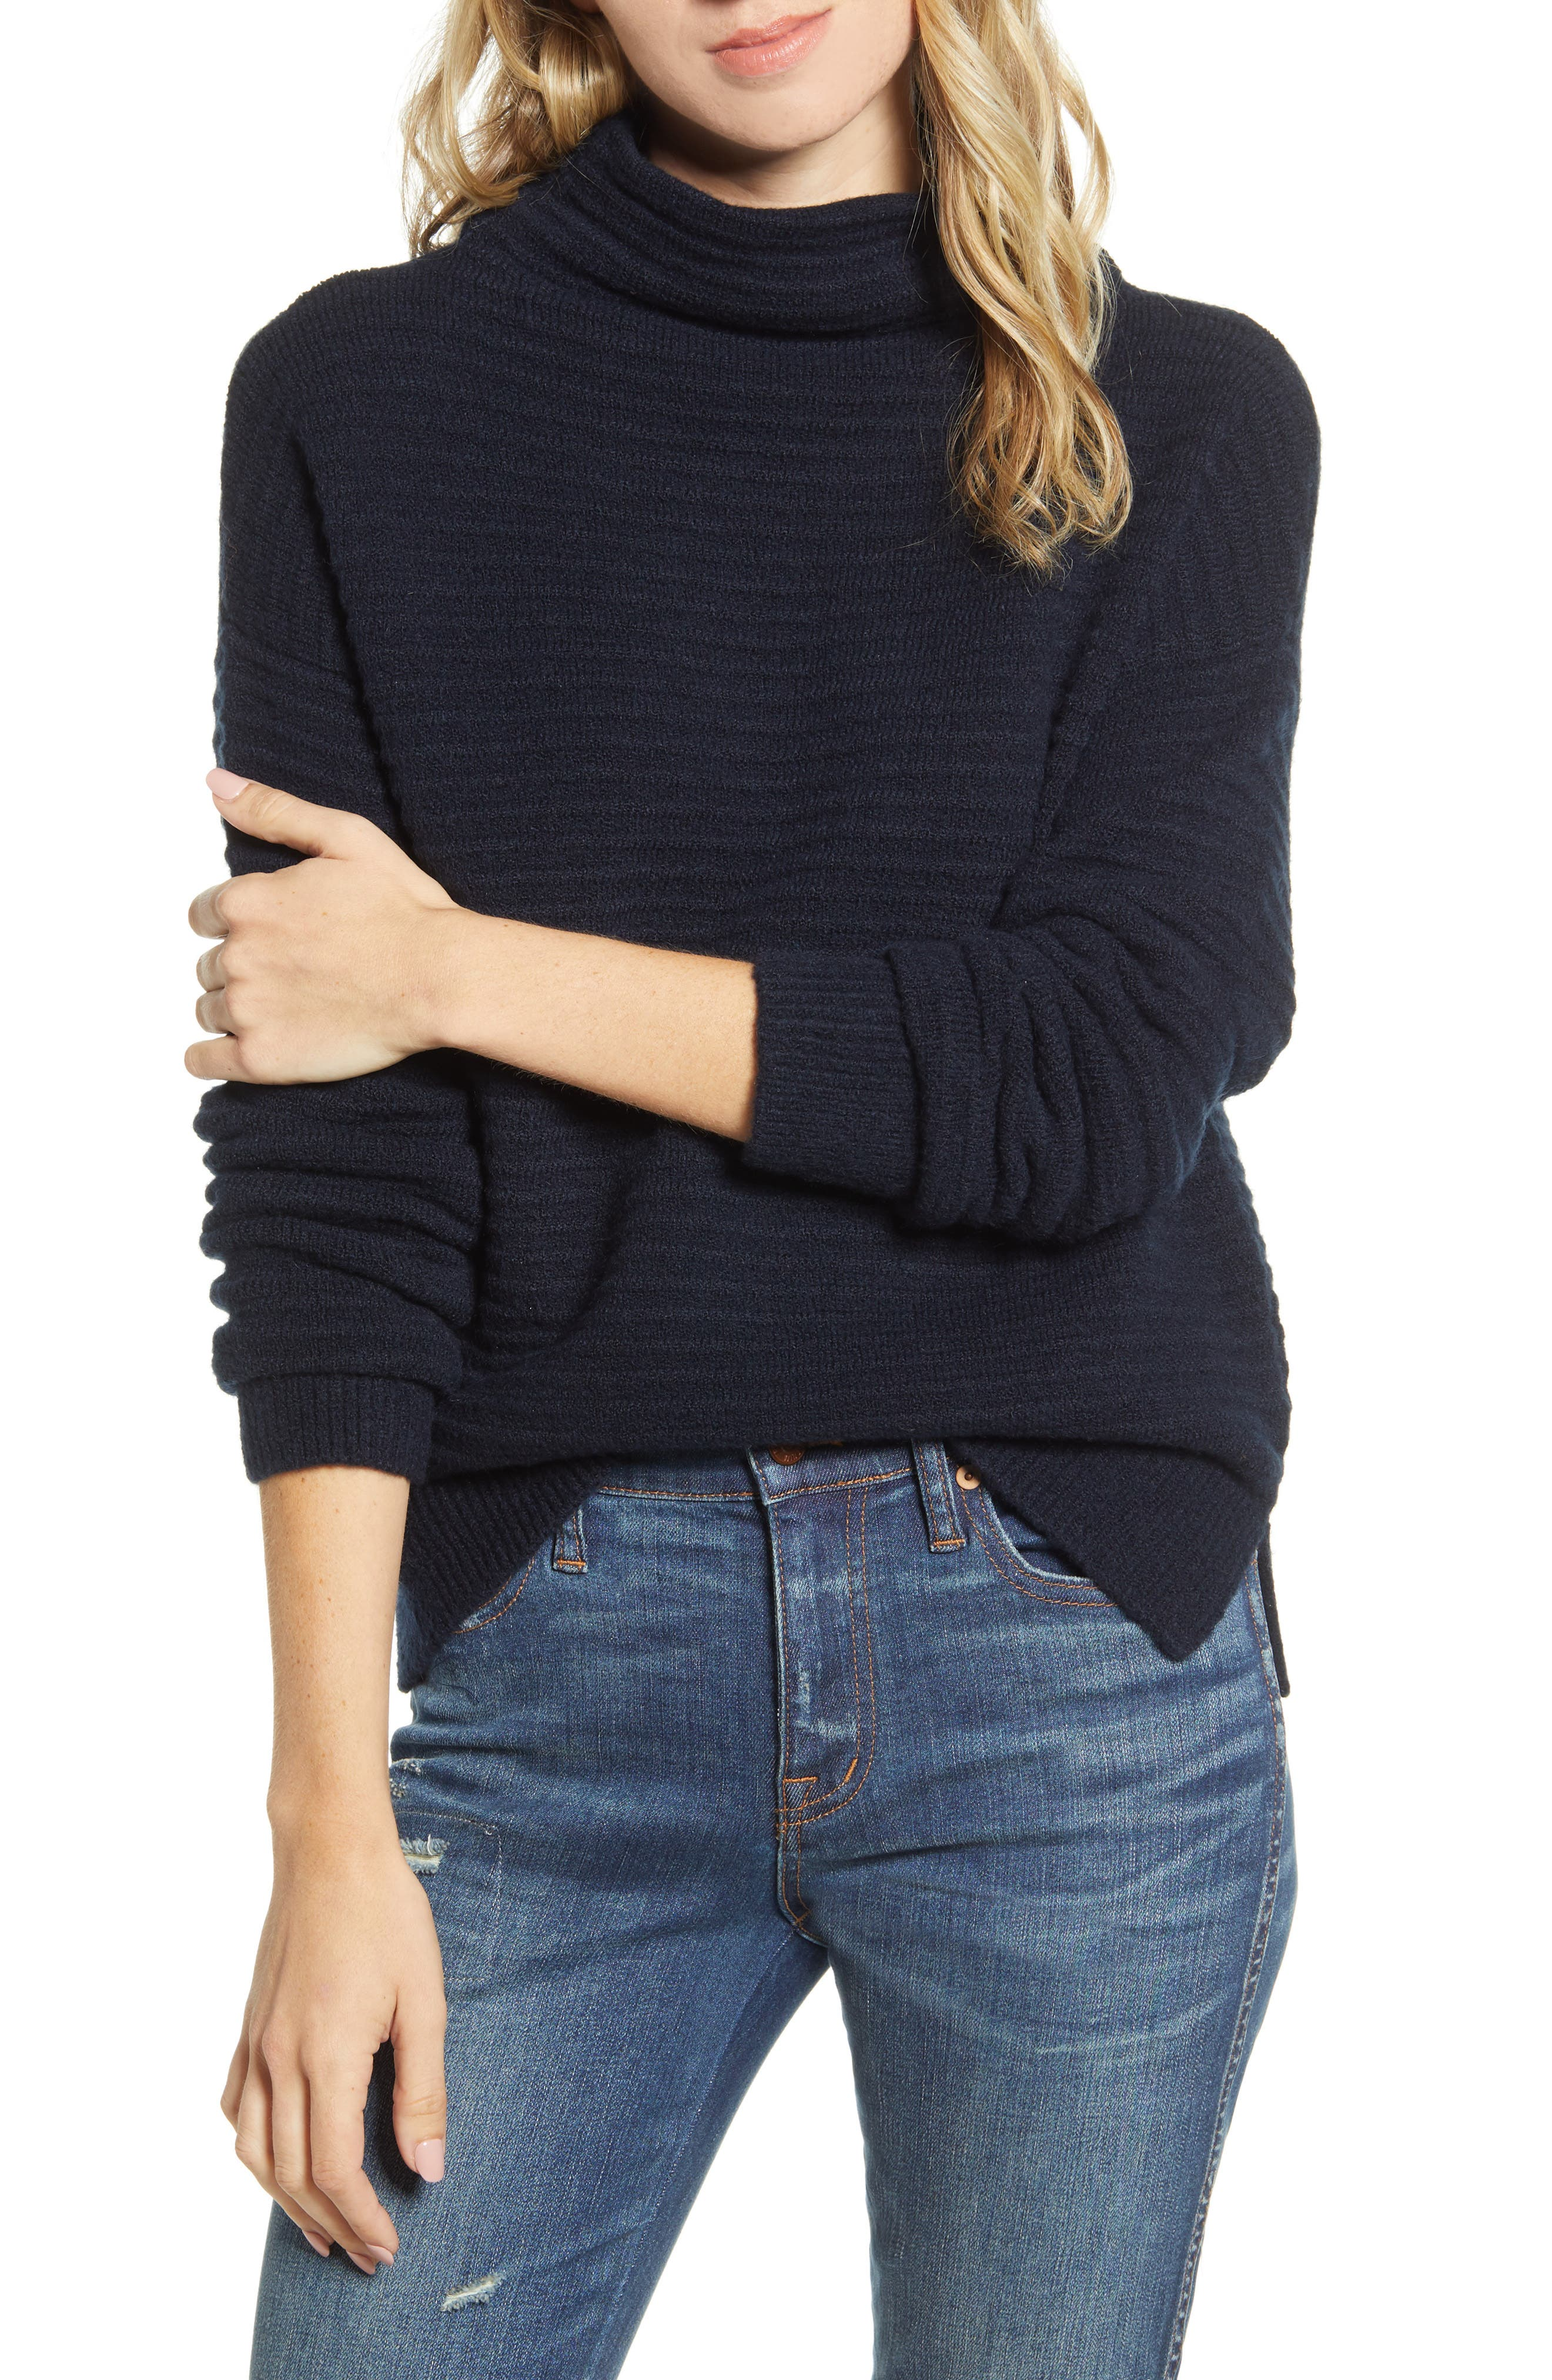 Madewell Belmont Mock Neck Sweater (Regular & Plus Size)